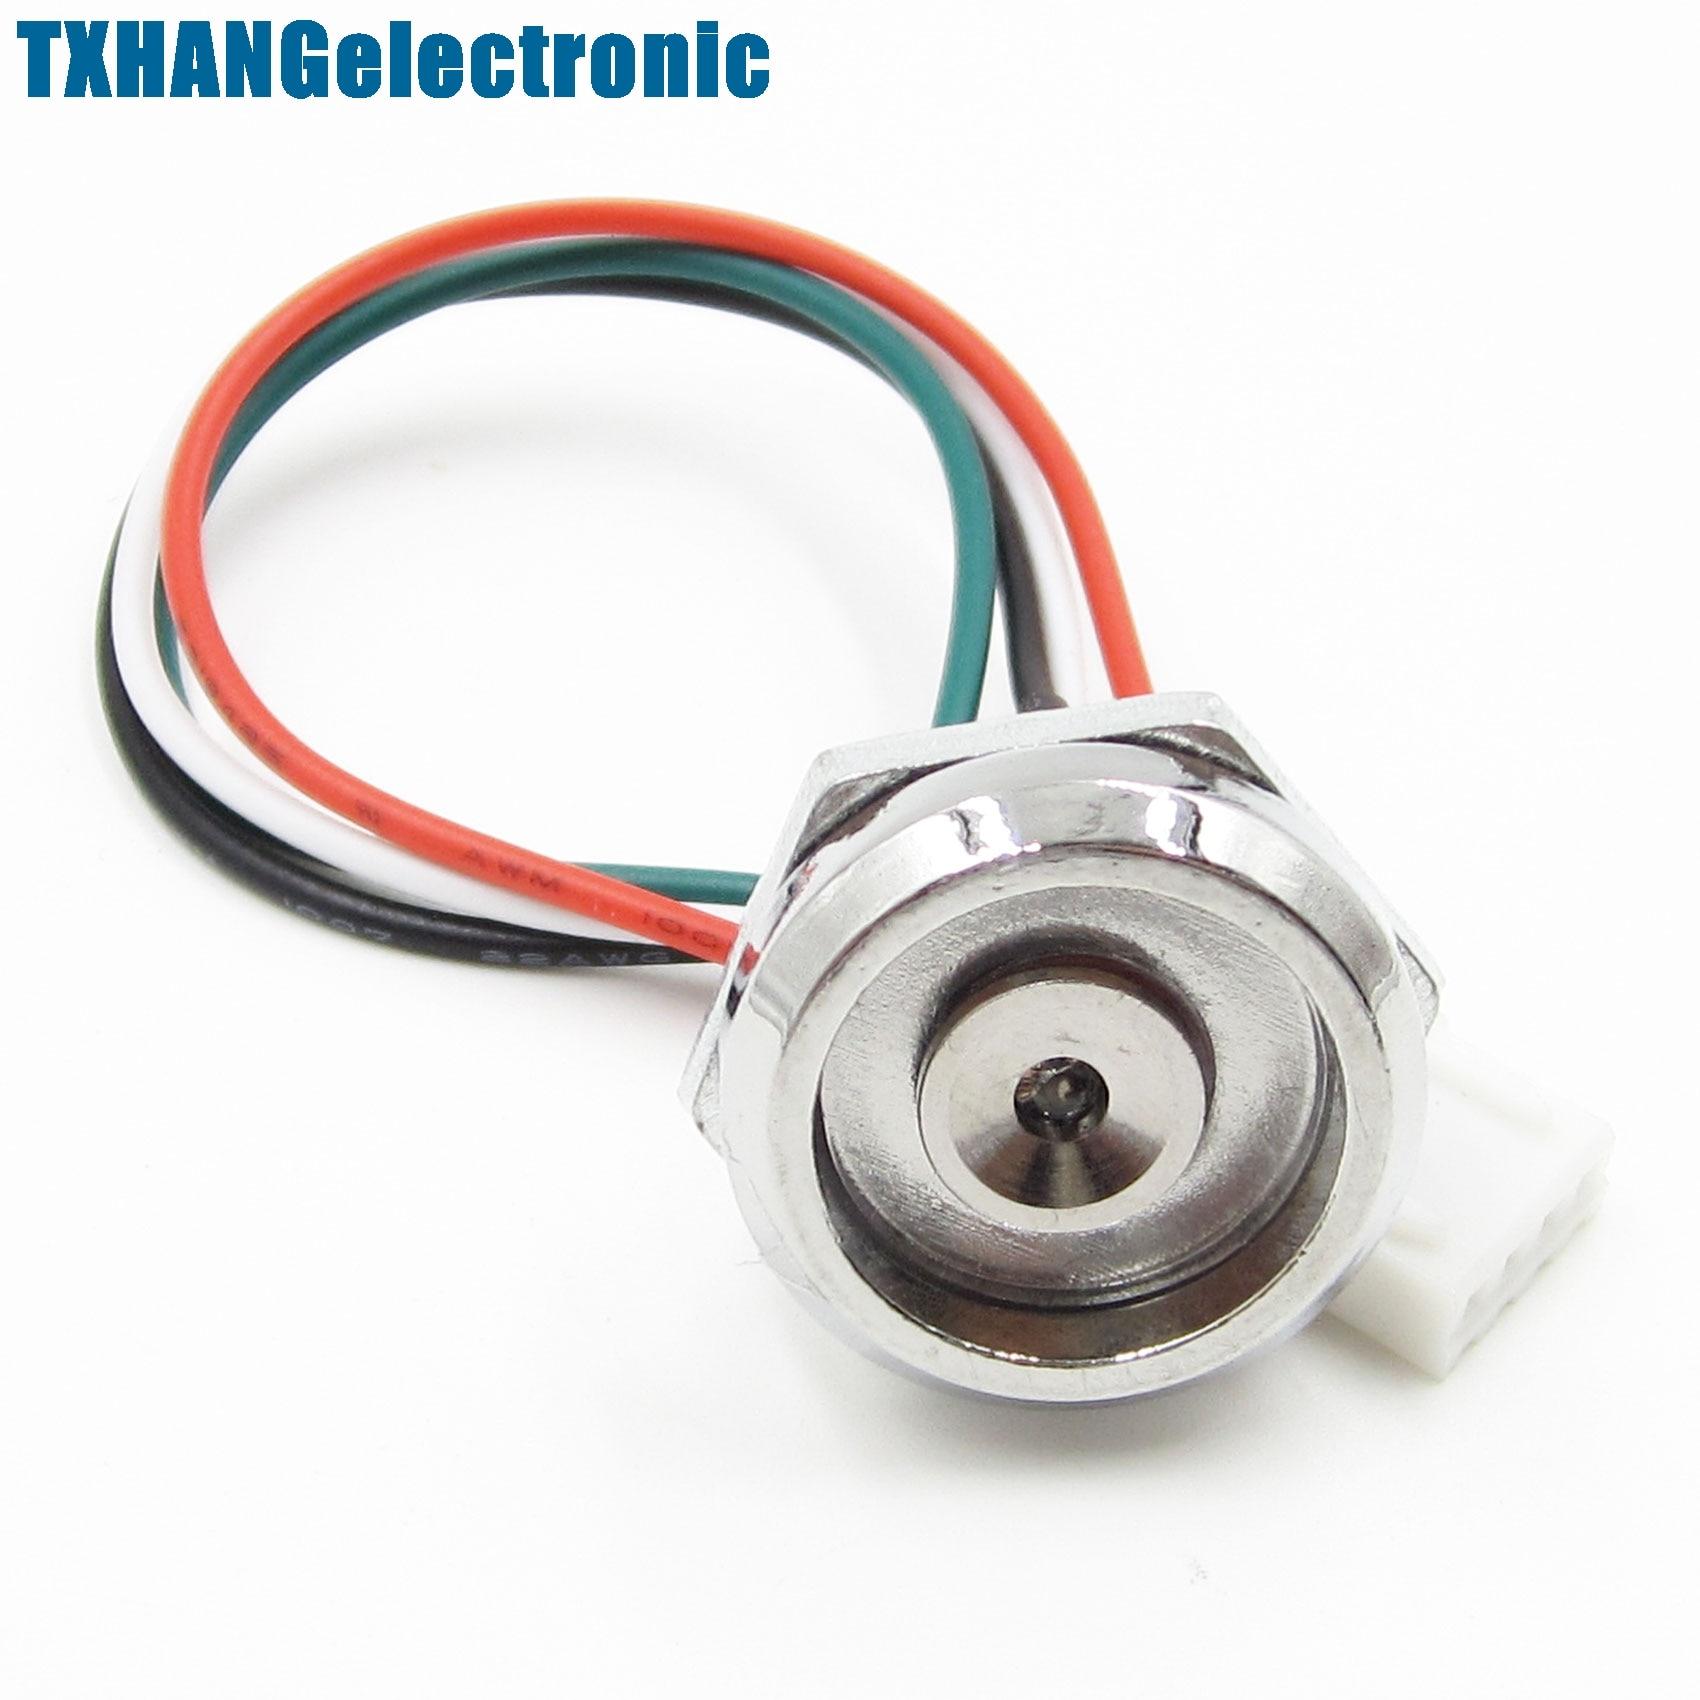 5PCS TM probe DS9092 Zinc Alloy probe iButton probe//reader with LED